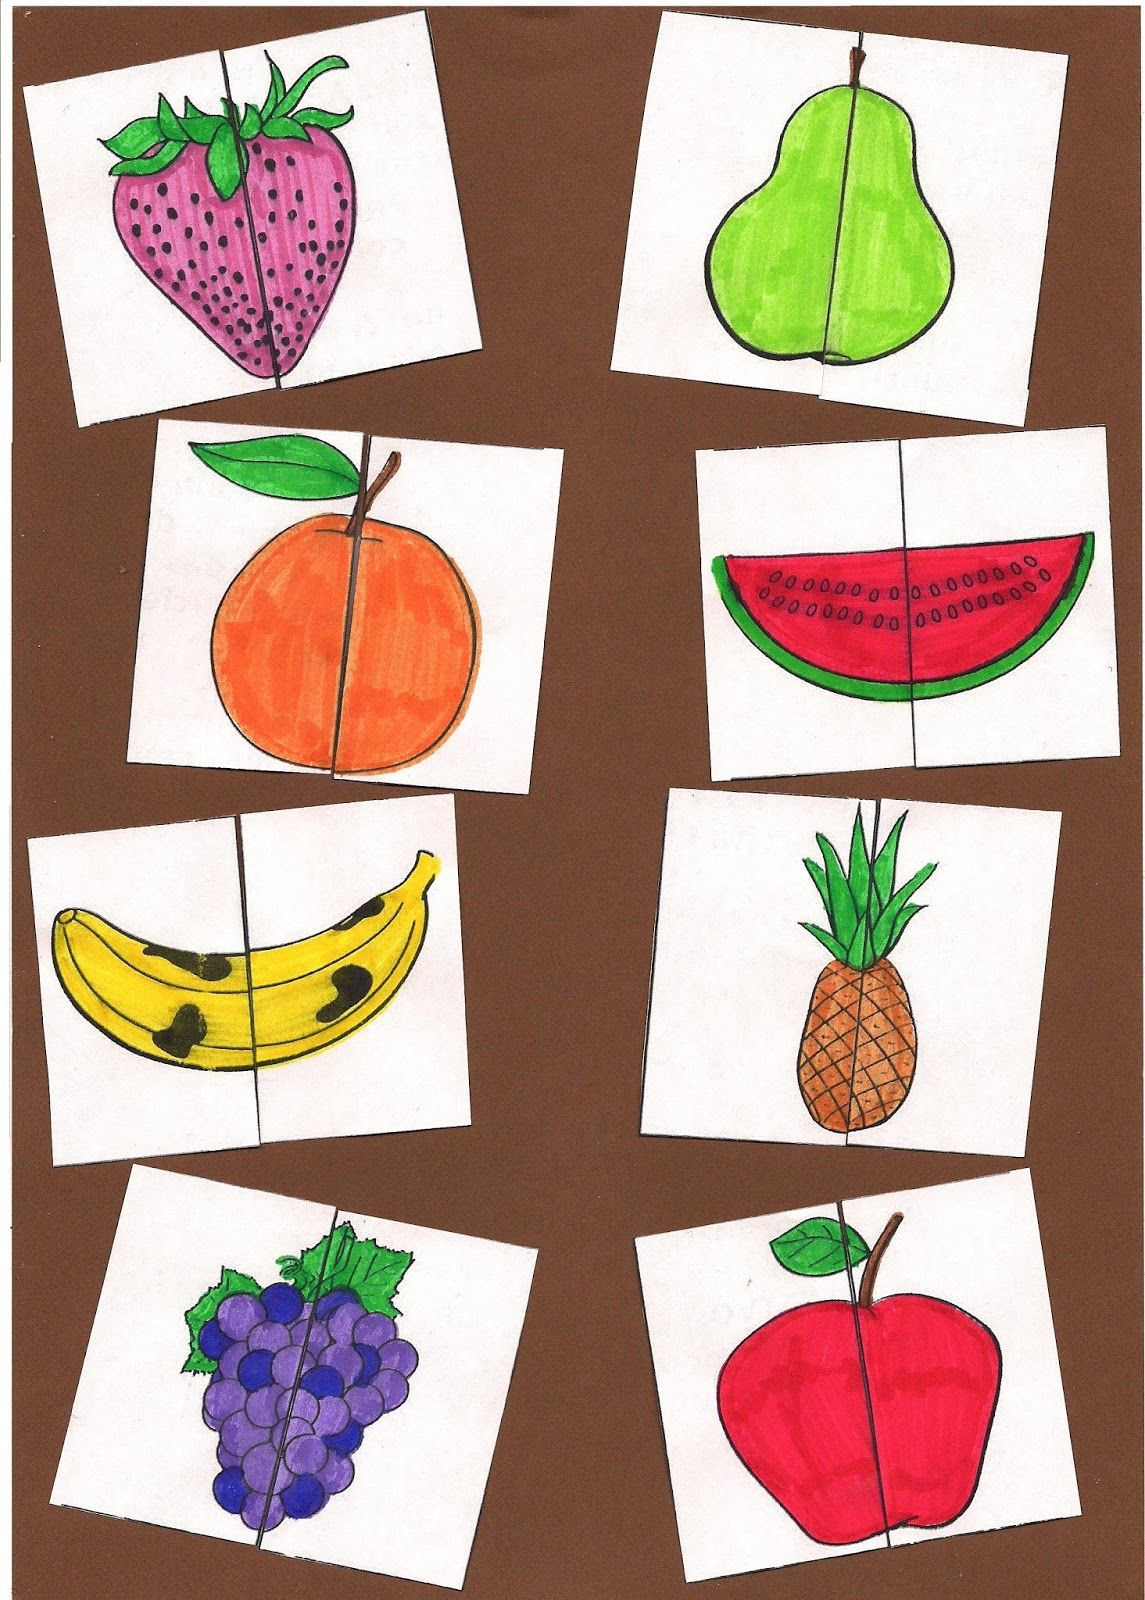 Menta m s chocolate recursos para educaci n infantil for Como hacer un proyecto de comedor infantil